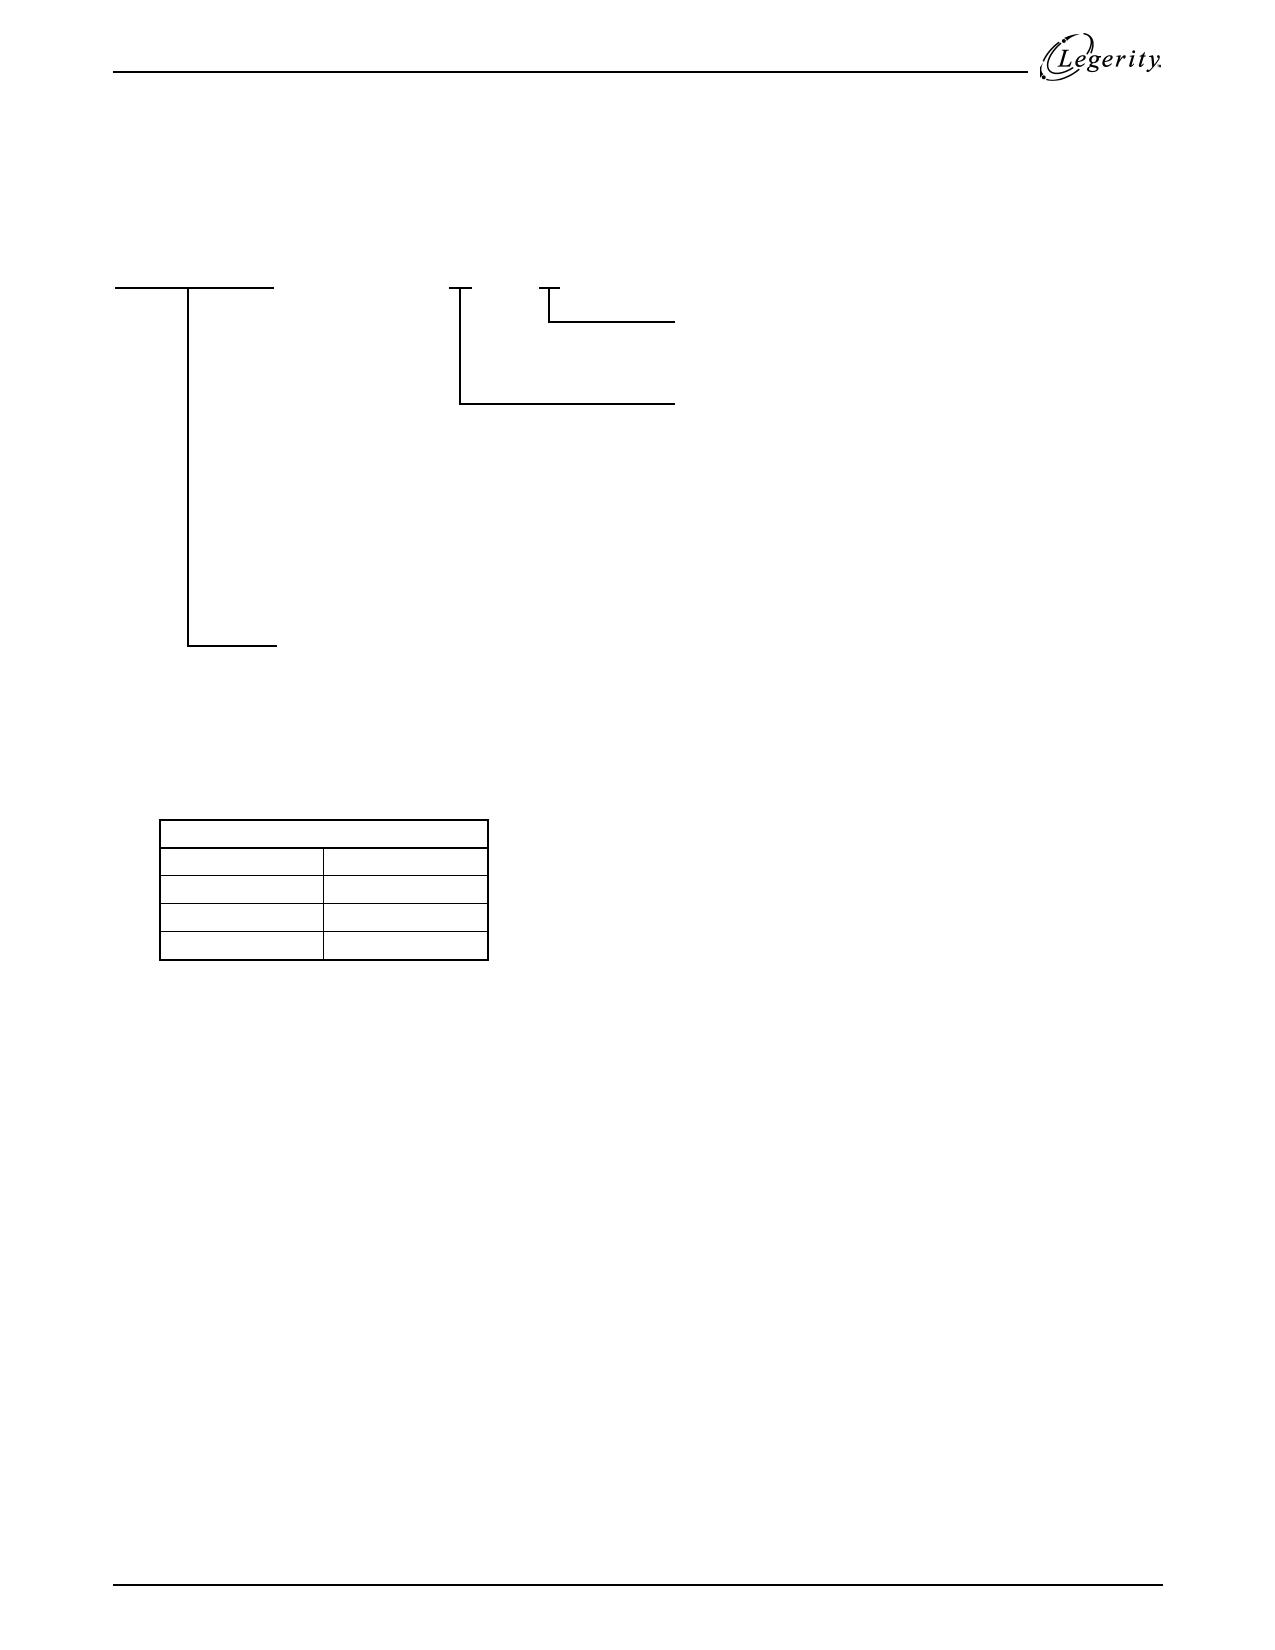 Am79Q031 pdf